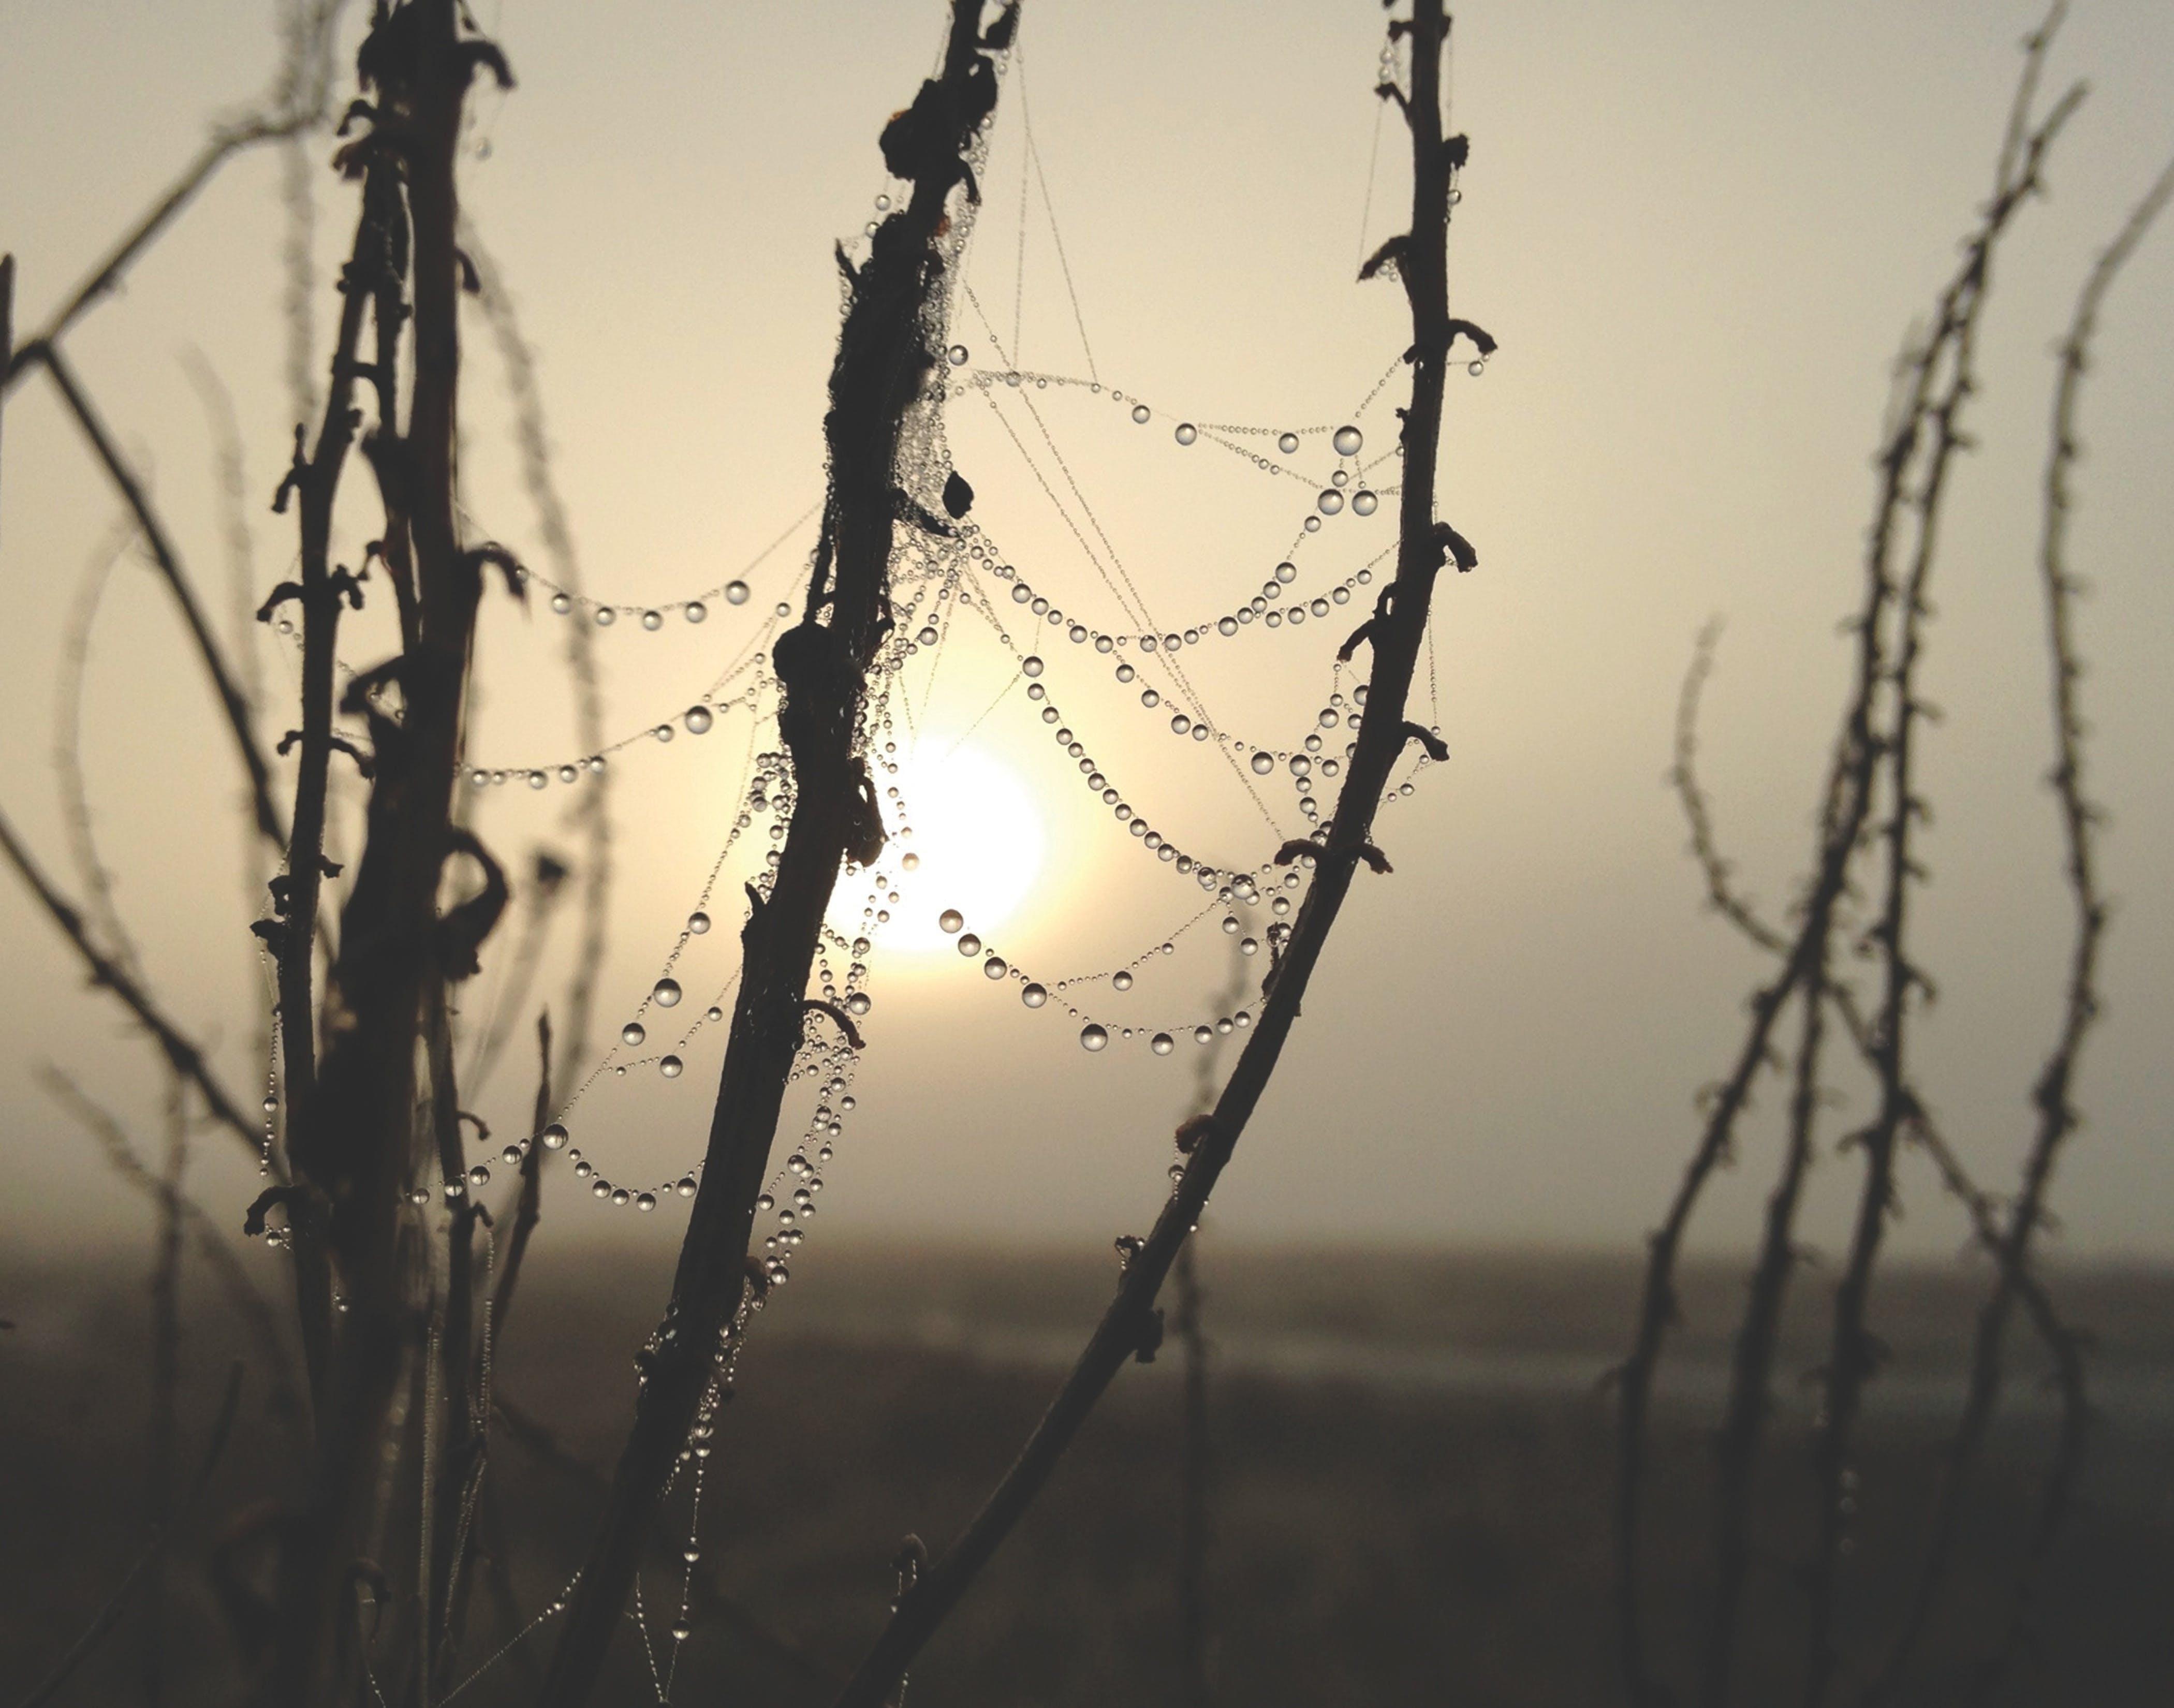 Dew on Plant Stem